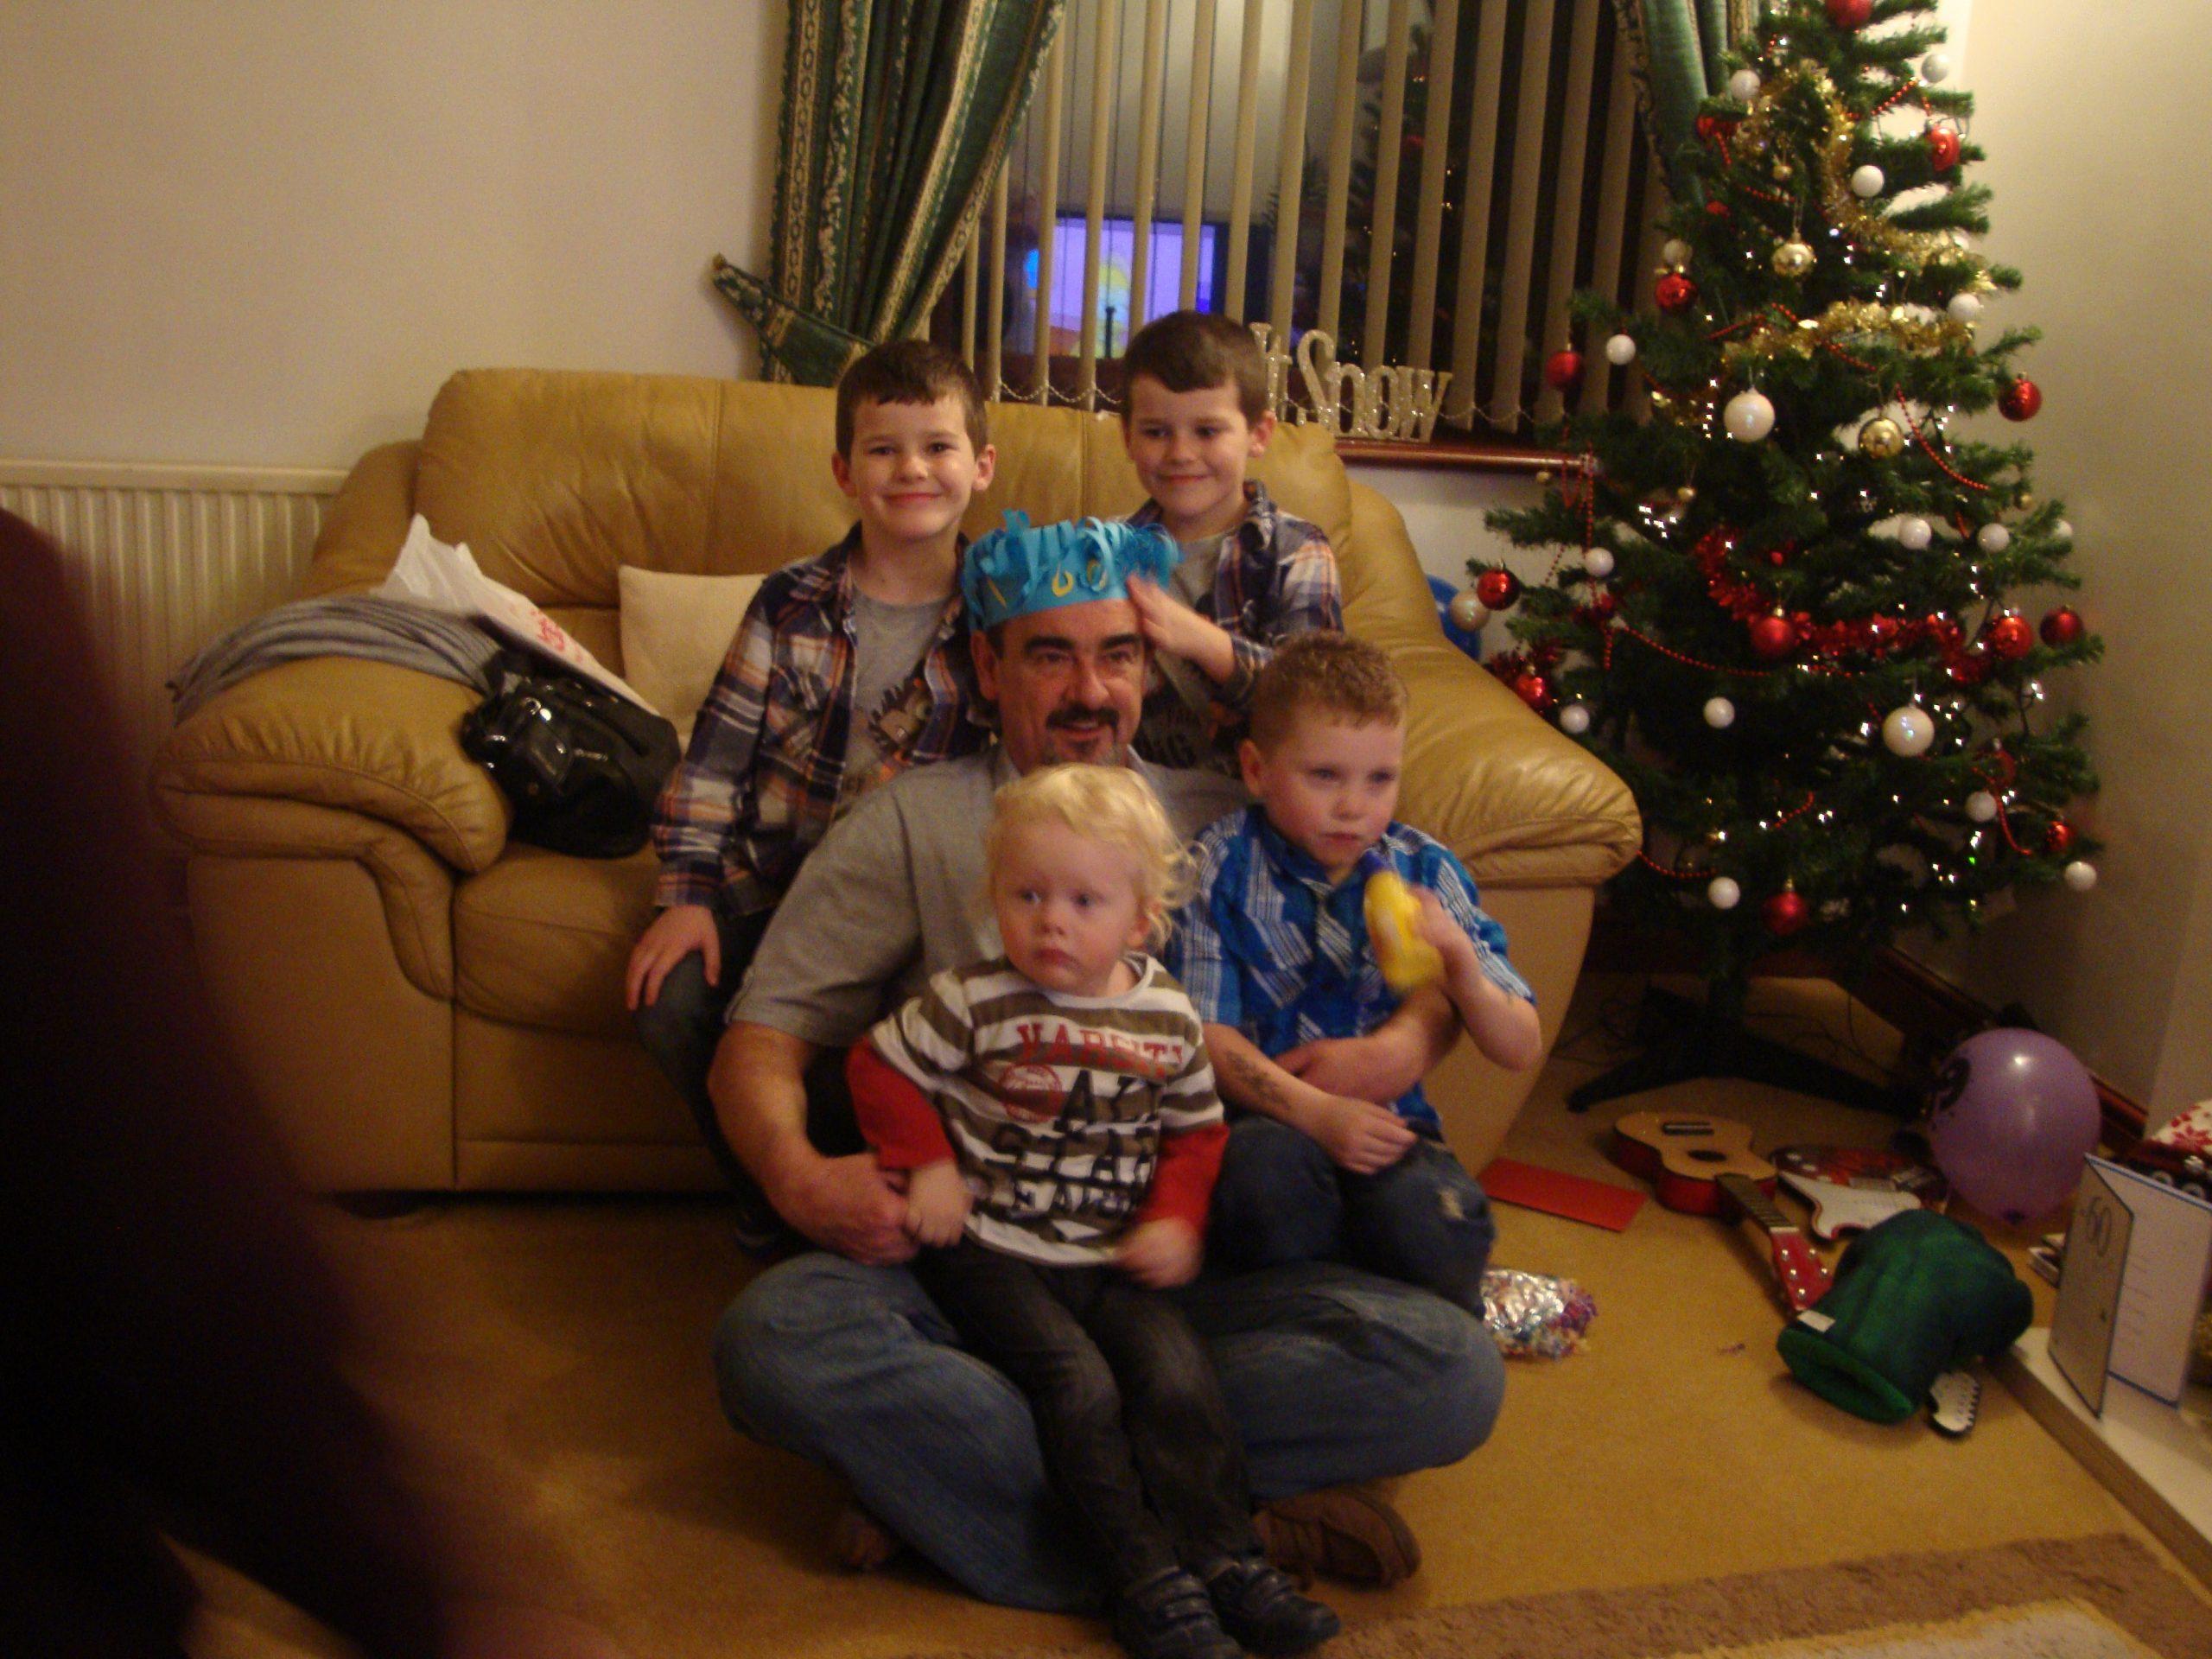 Dan, Chris, Jayden, Zak and Joel